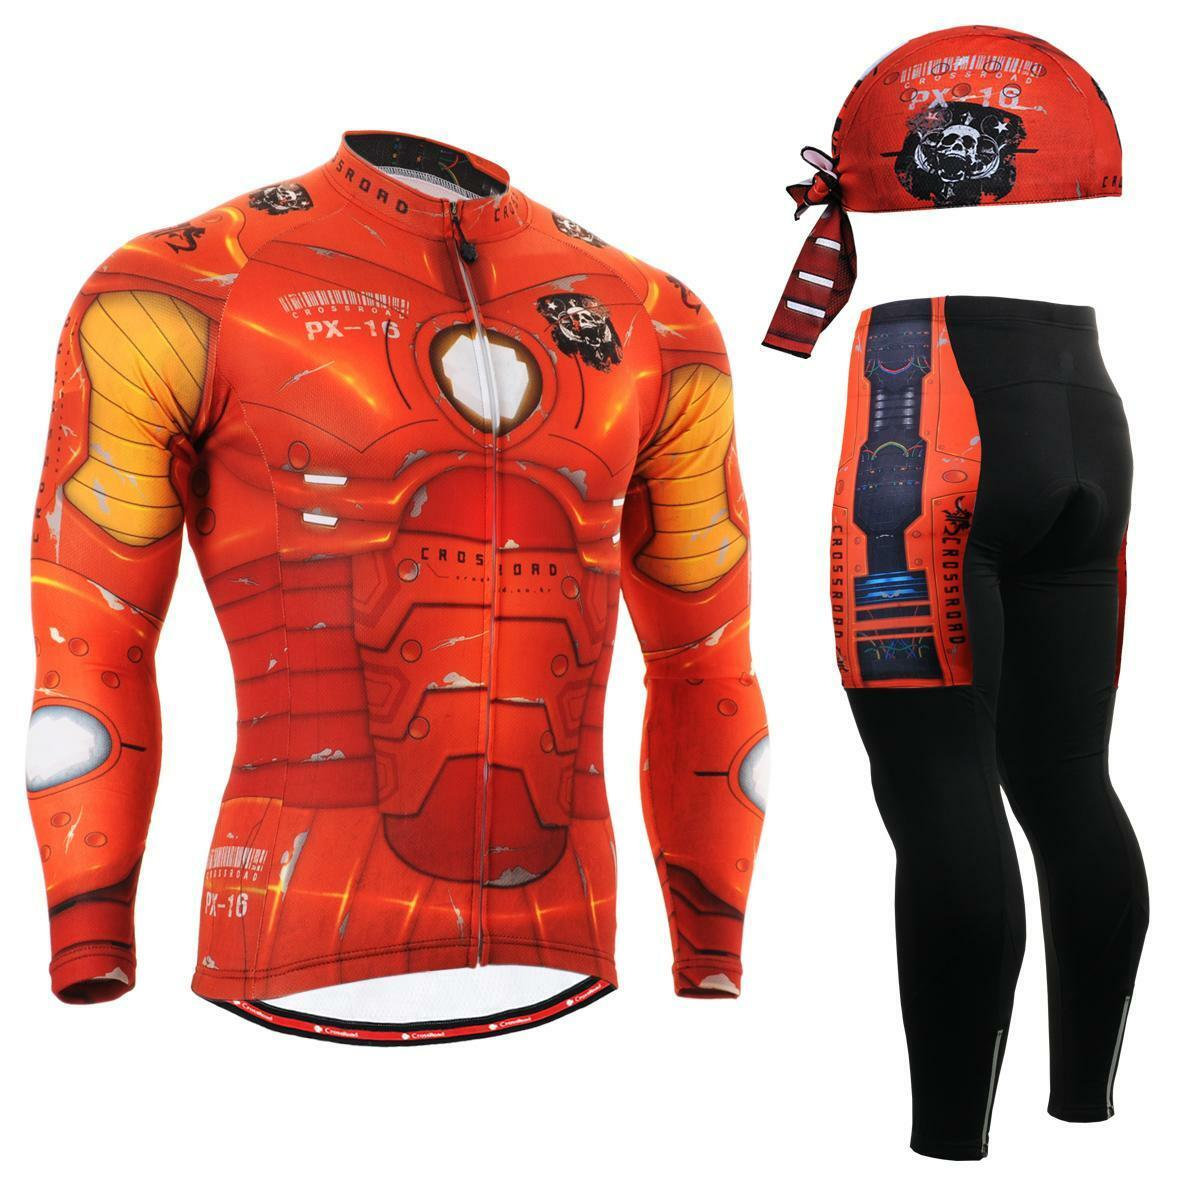 FIXGEAR CS-801 SET Cycling Cycling Cycling Jersey & Padded Pants,MTB Bike,BMX,Beanie Free GIFT afbedc